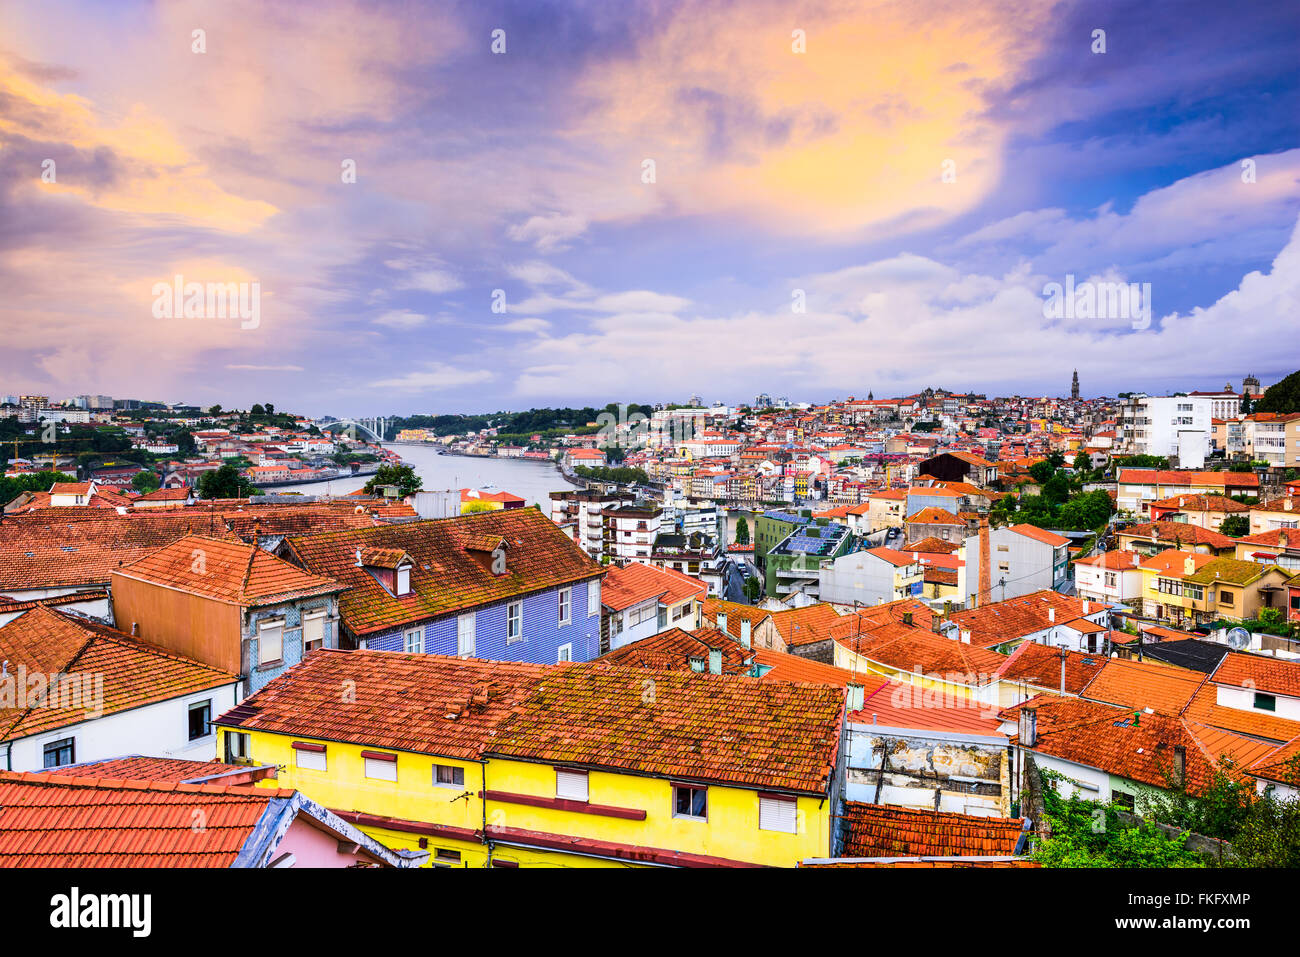 Vila Nova de Gaia, Portugal old town skyline towards Porto. - Stock Image